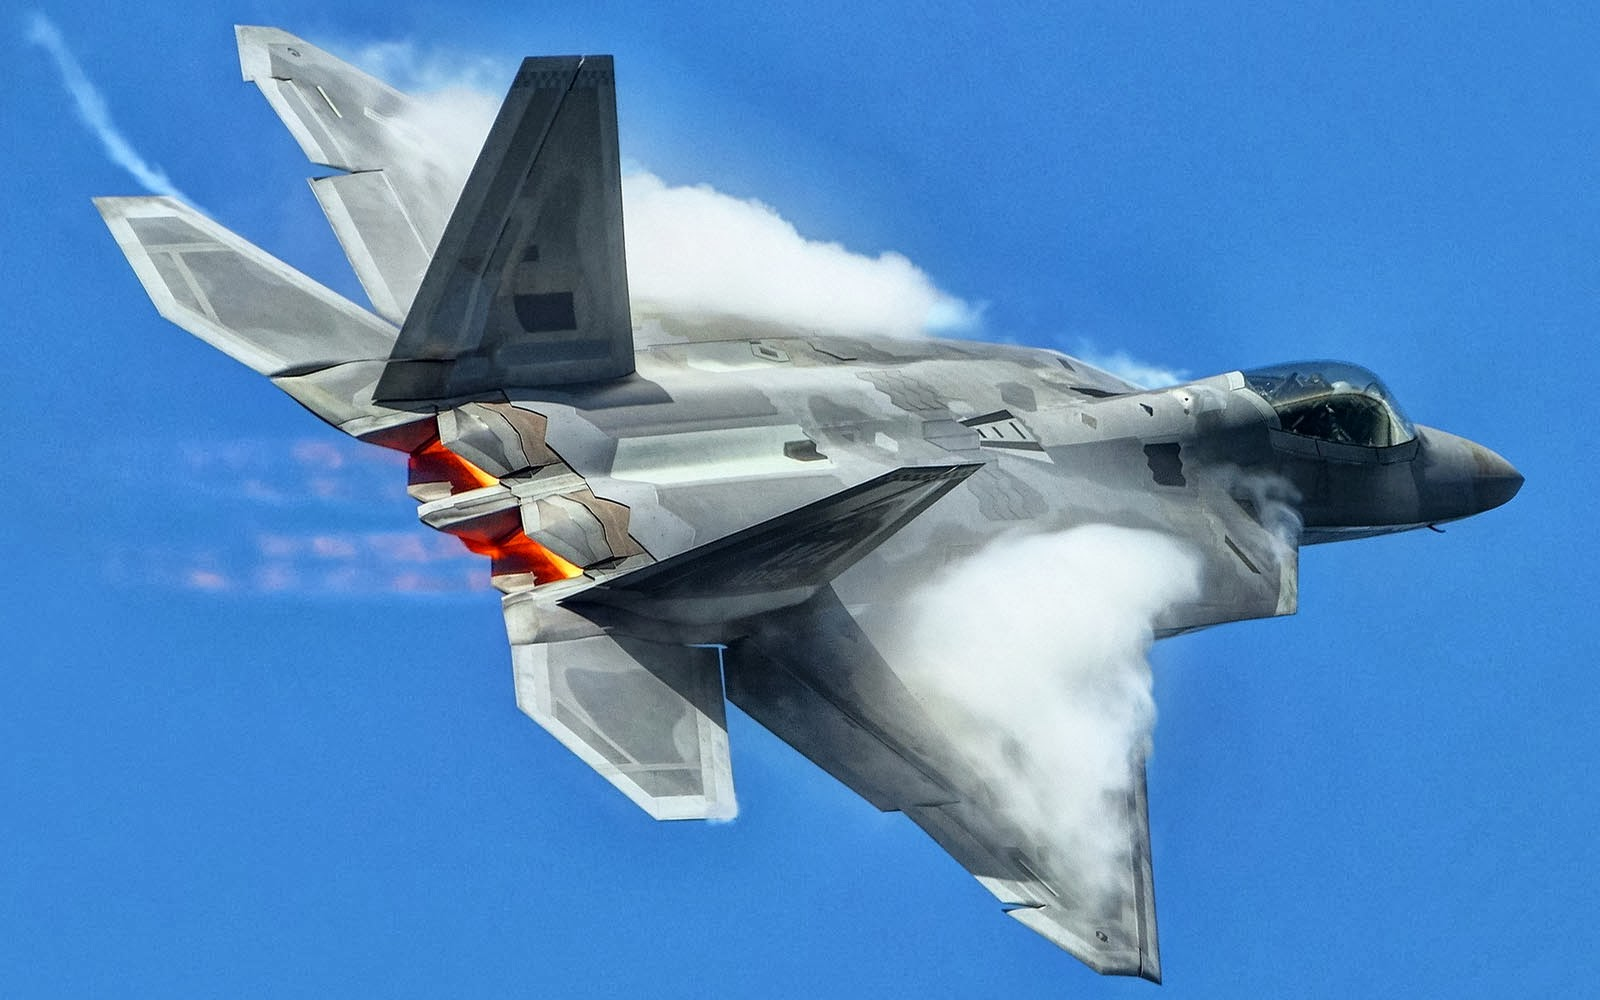 wallpapers: Lockheed Martin F-22 Raptor Wallpapers